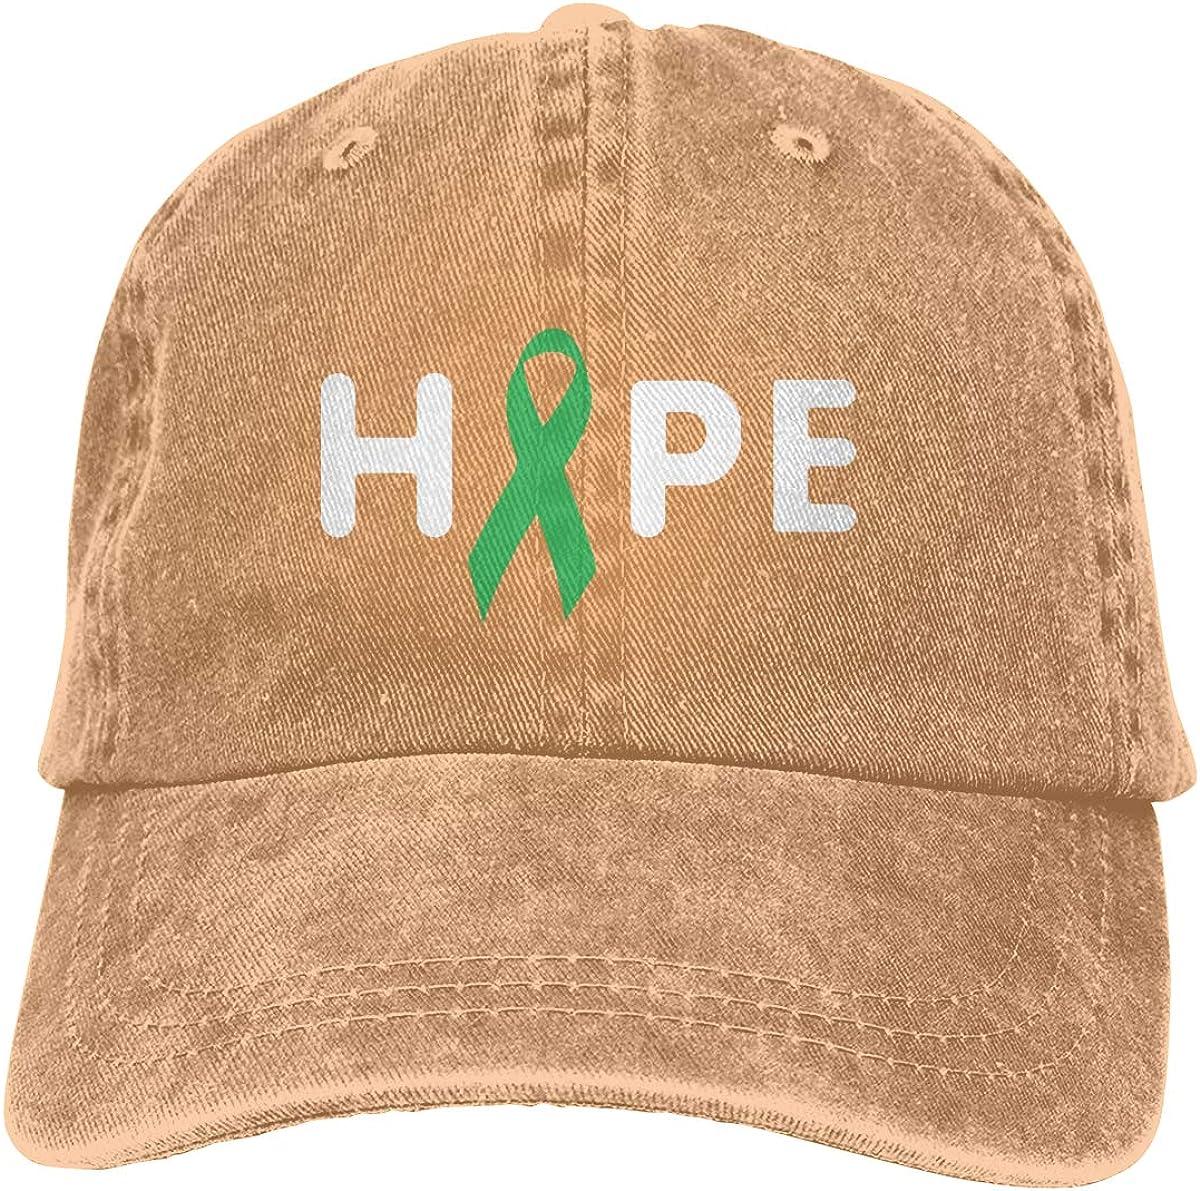 Hope Unisex Custom Cowboy Hip Hop Cap Adjustable Baseball Cap